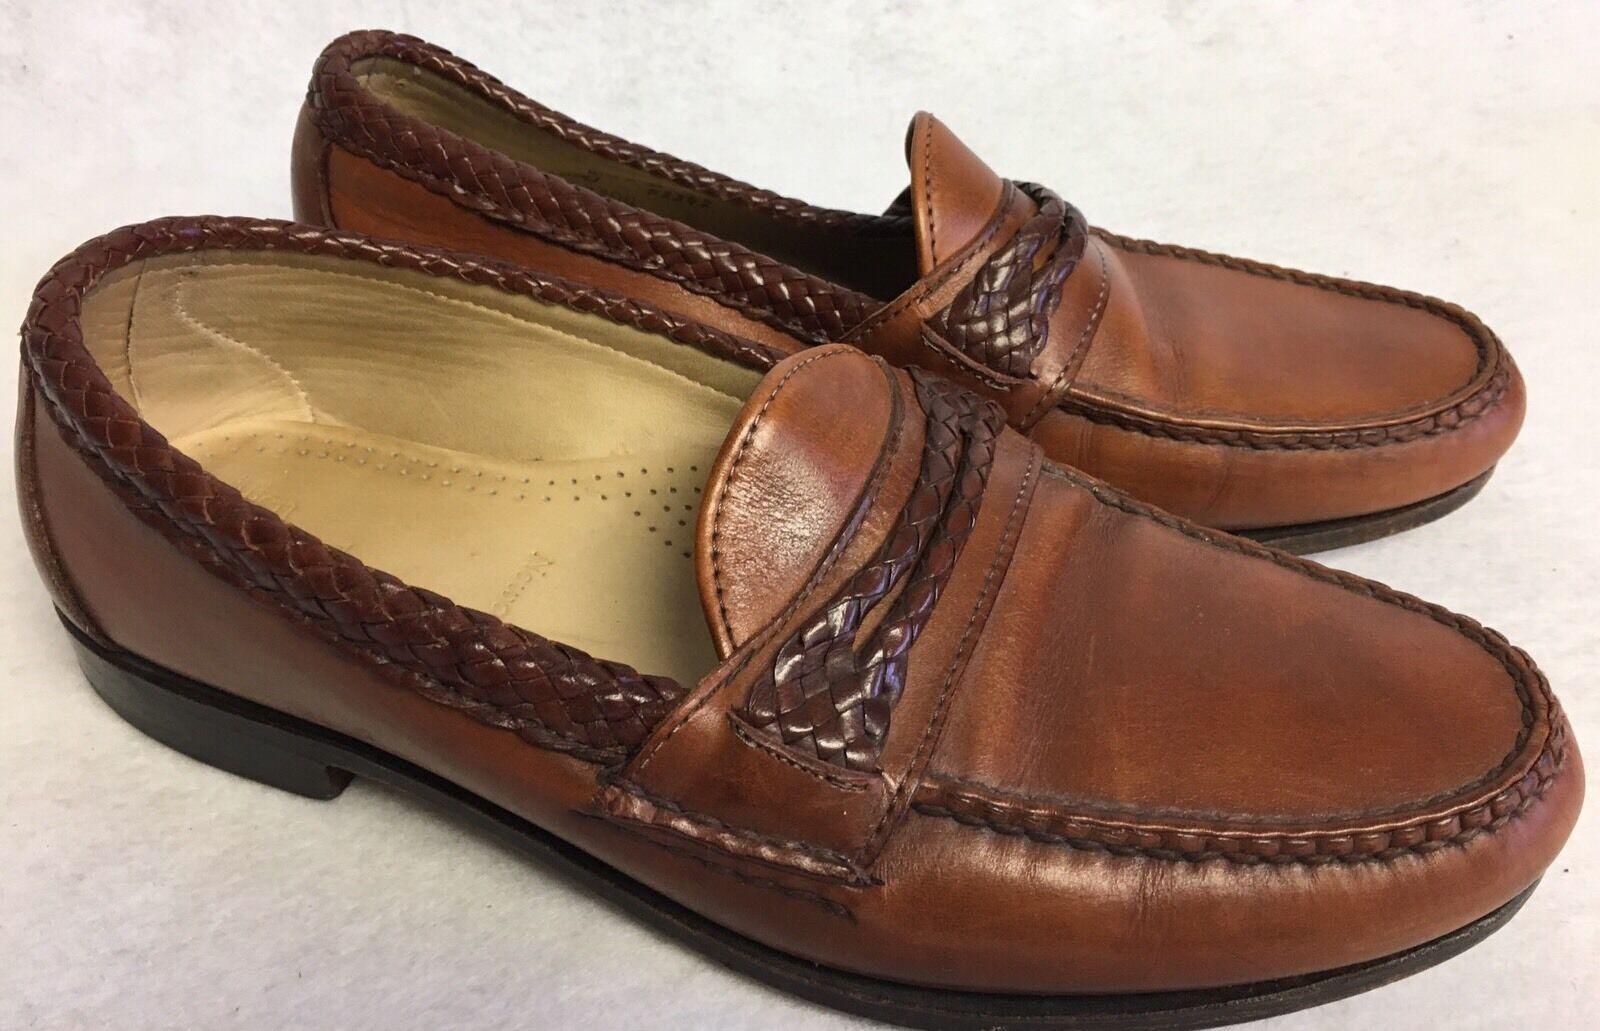 Allen Edmonds Newcomb Mens Chestnut Woven Double Strap Loafers Merlot Braided